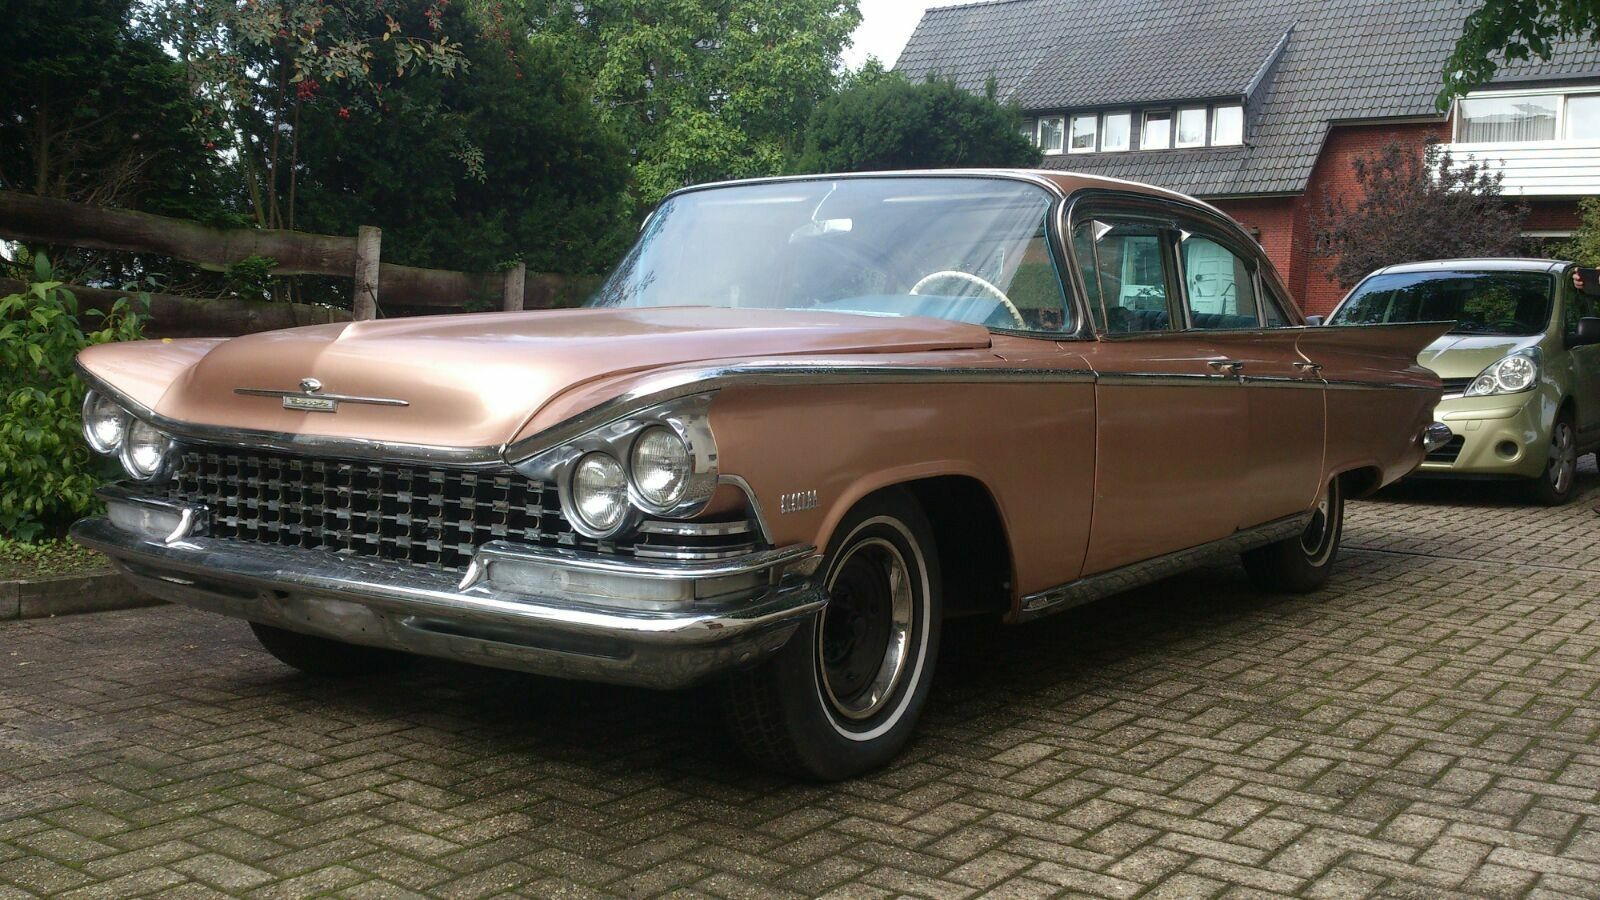 1959 Buick Electra Buick Electra 1959